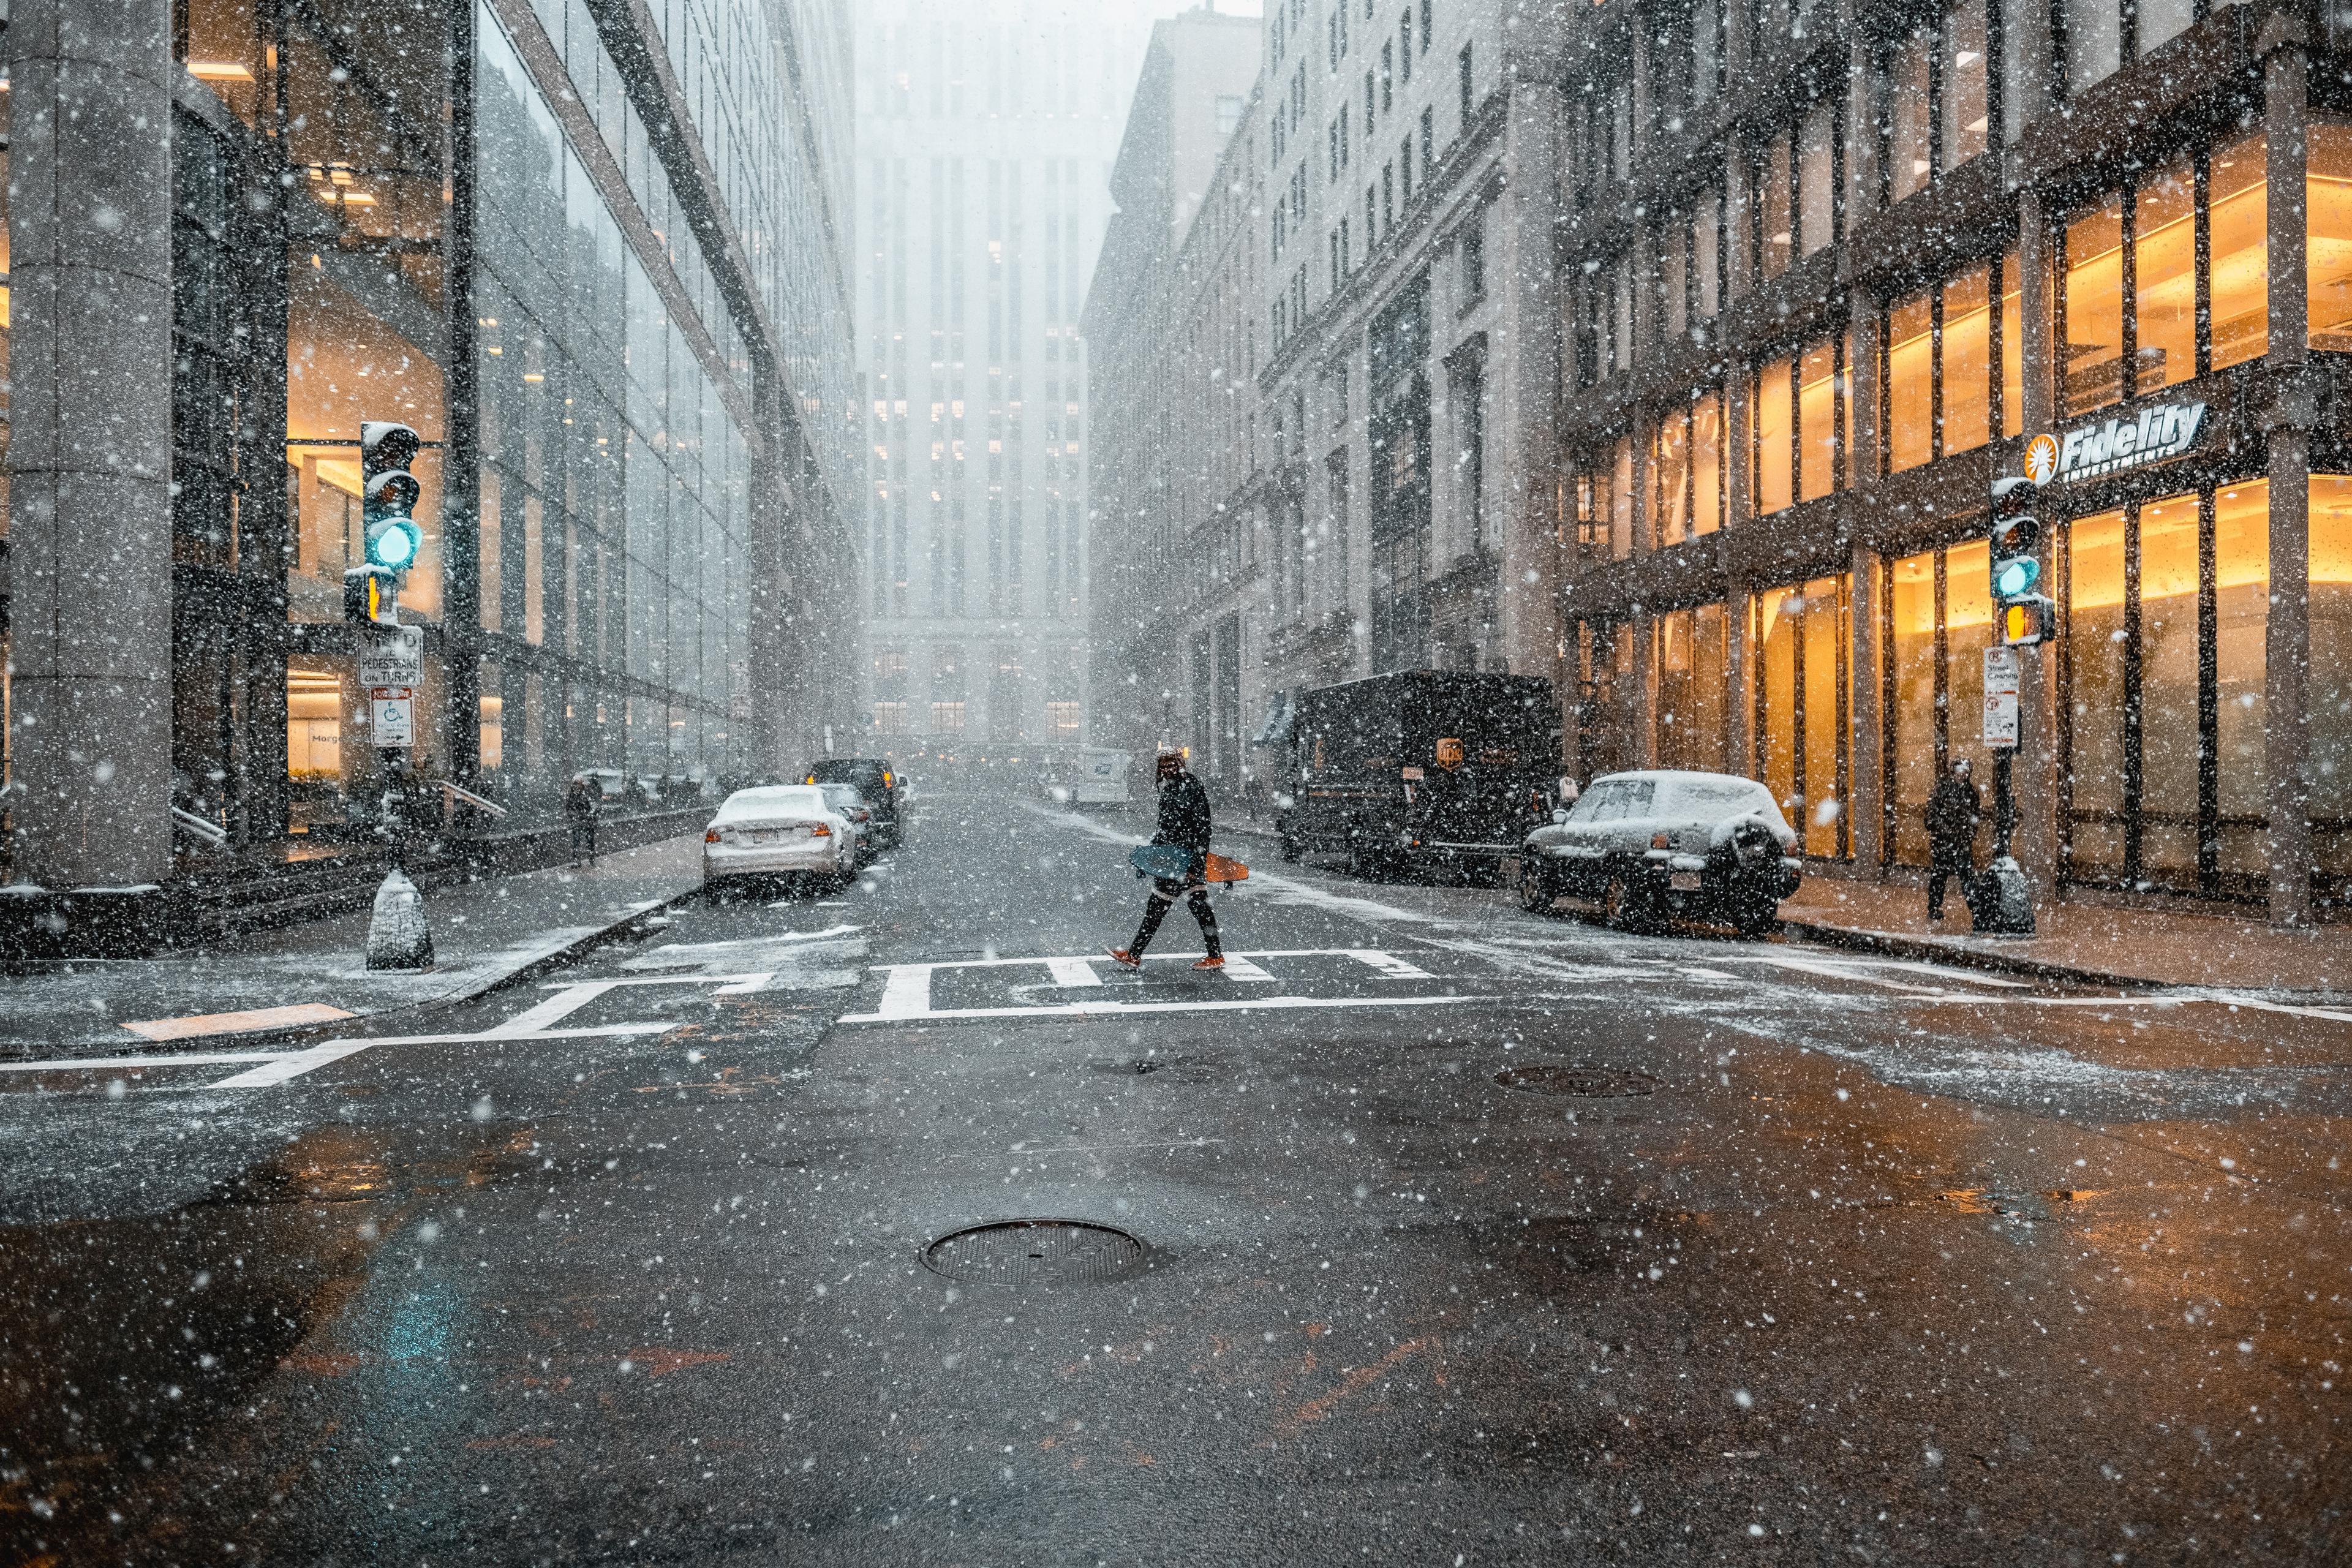 person street snow 1574939488 - Person Street Snow -